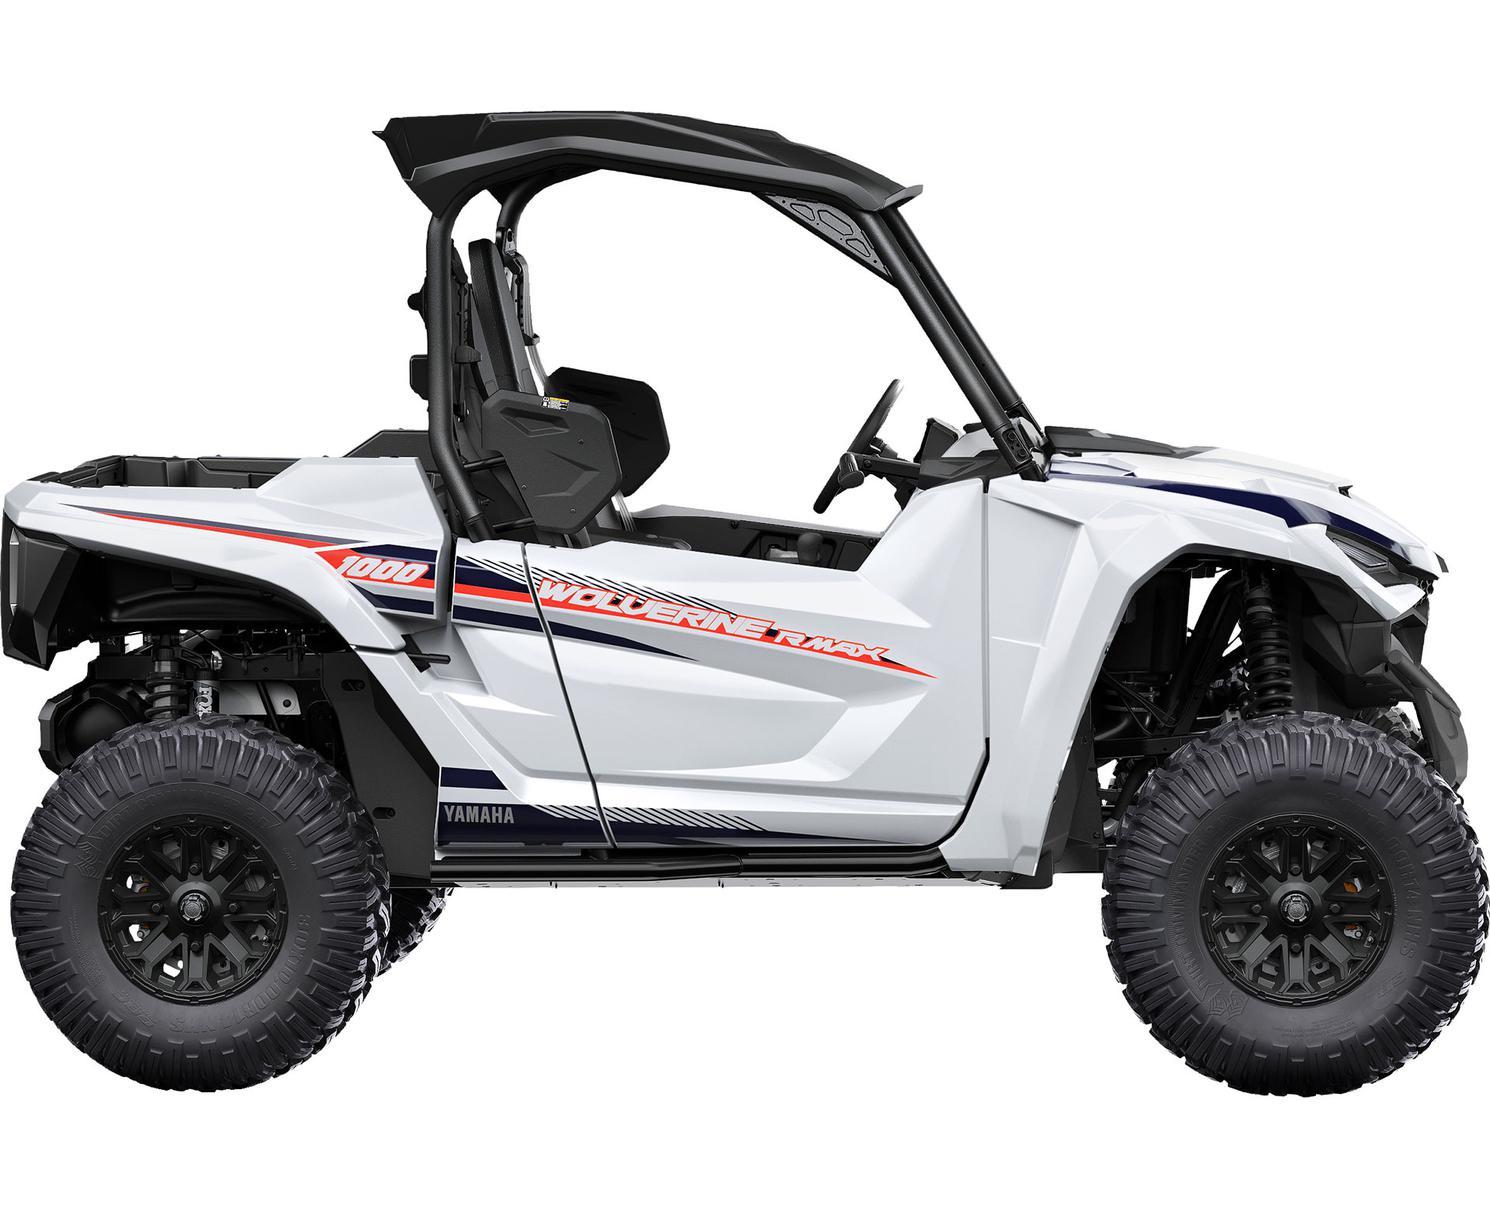 Yamaha Wolverine RMAX2 1000 à DAE Blanc Alpin 2021